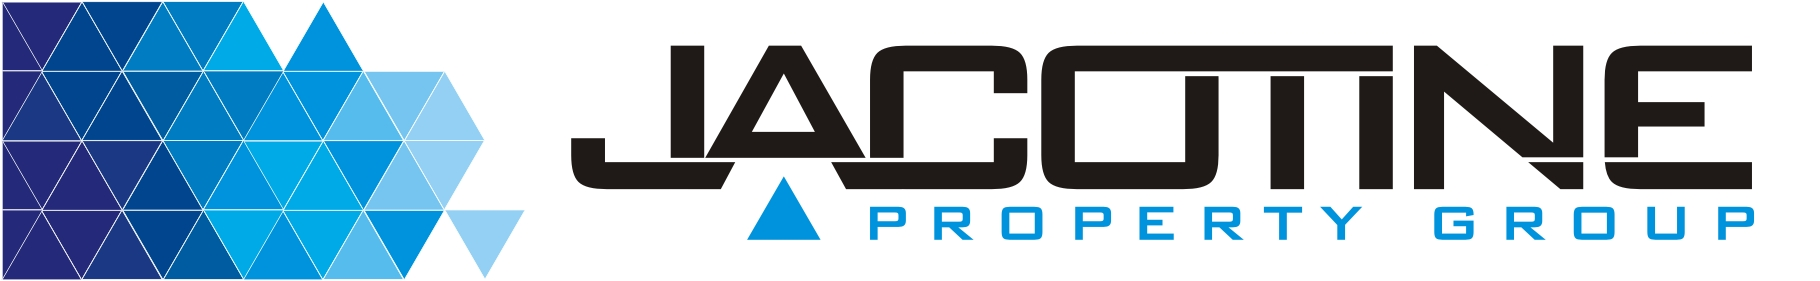 Jacotine Property